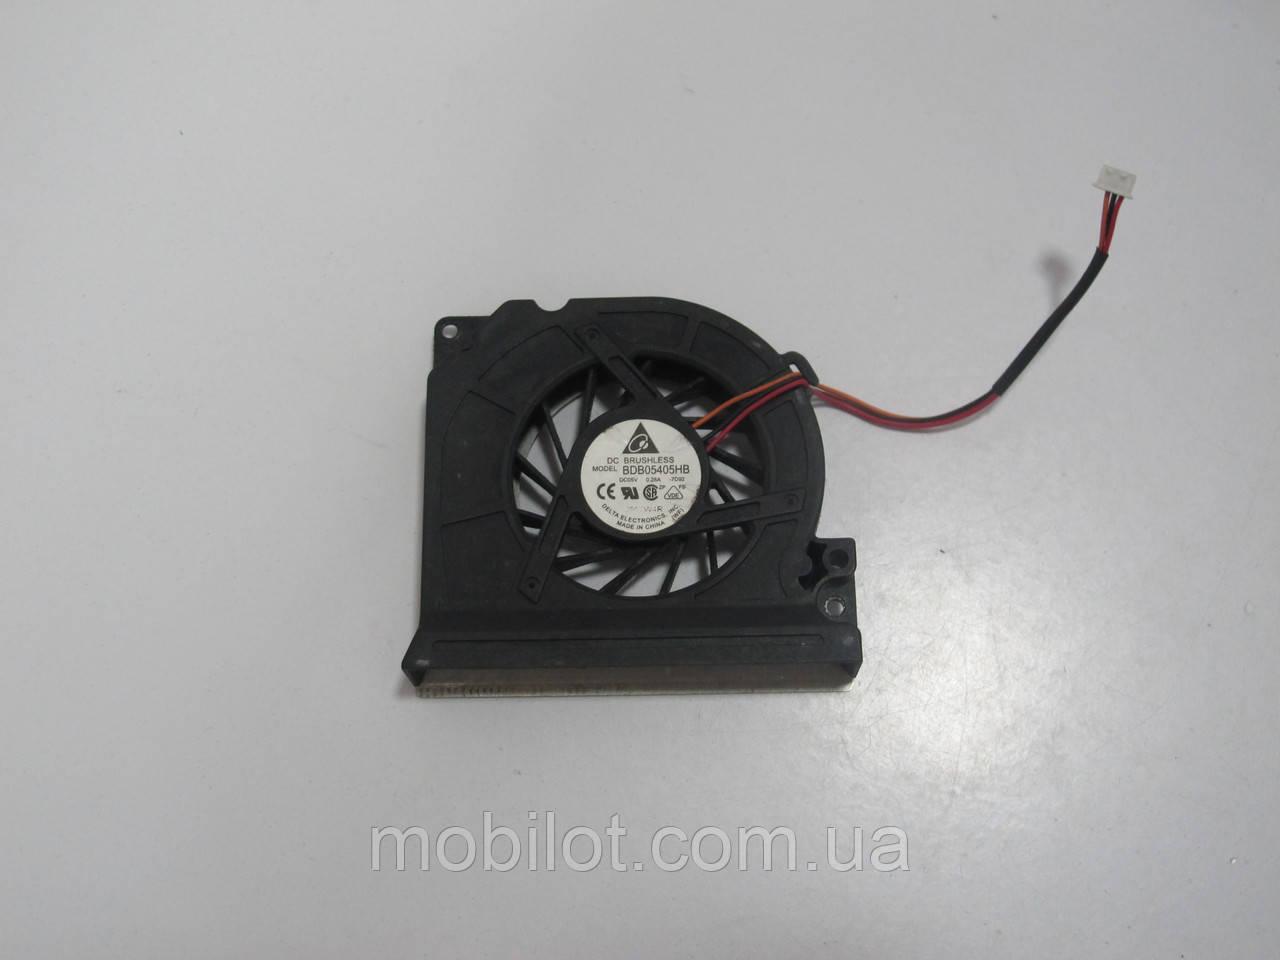 Система охлаждения (кулер) Samsung R58/ R60/ P500 (NZ-5030)